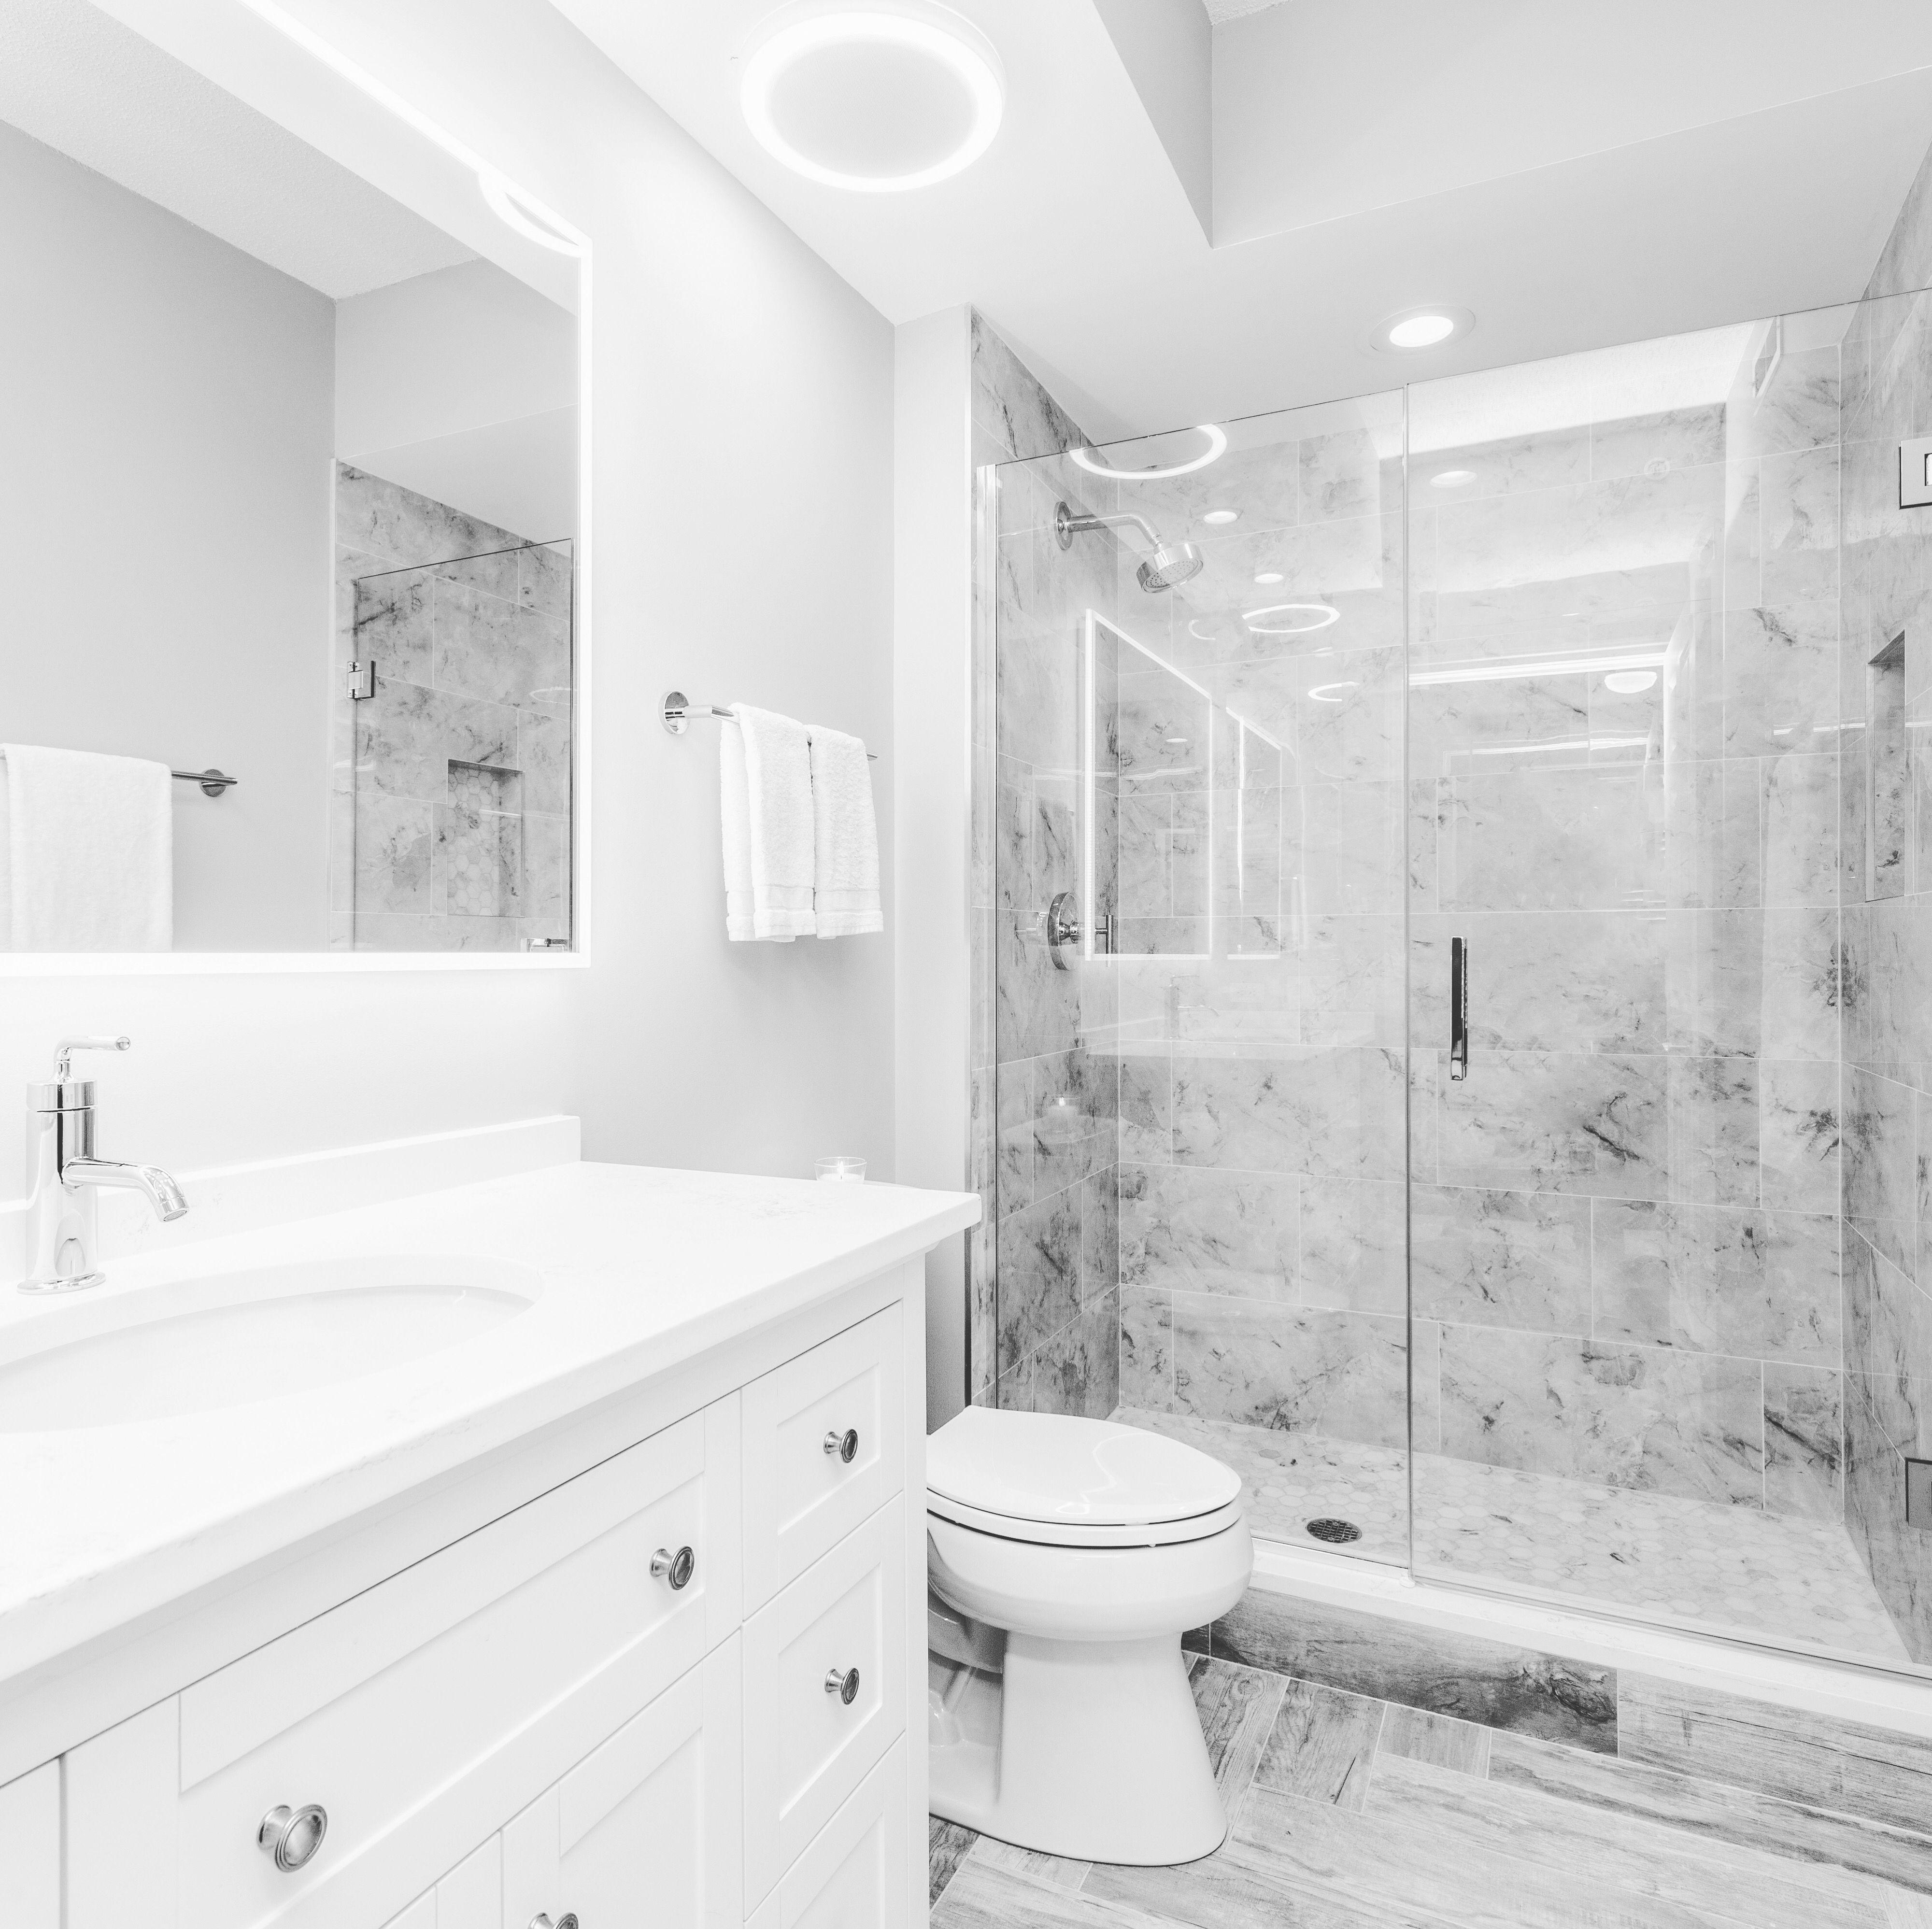 Bathroom Remodel Bathrooms Remodel Beautiful Bathrooms Bathroom Design